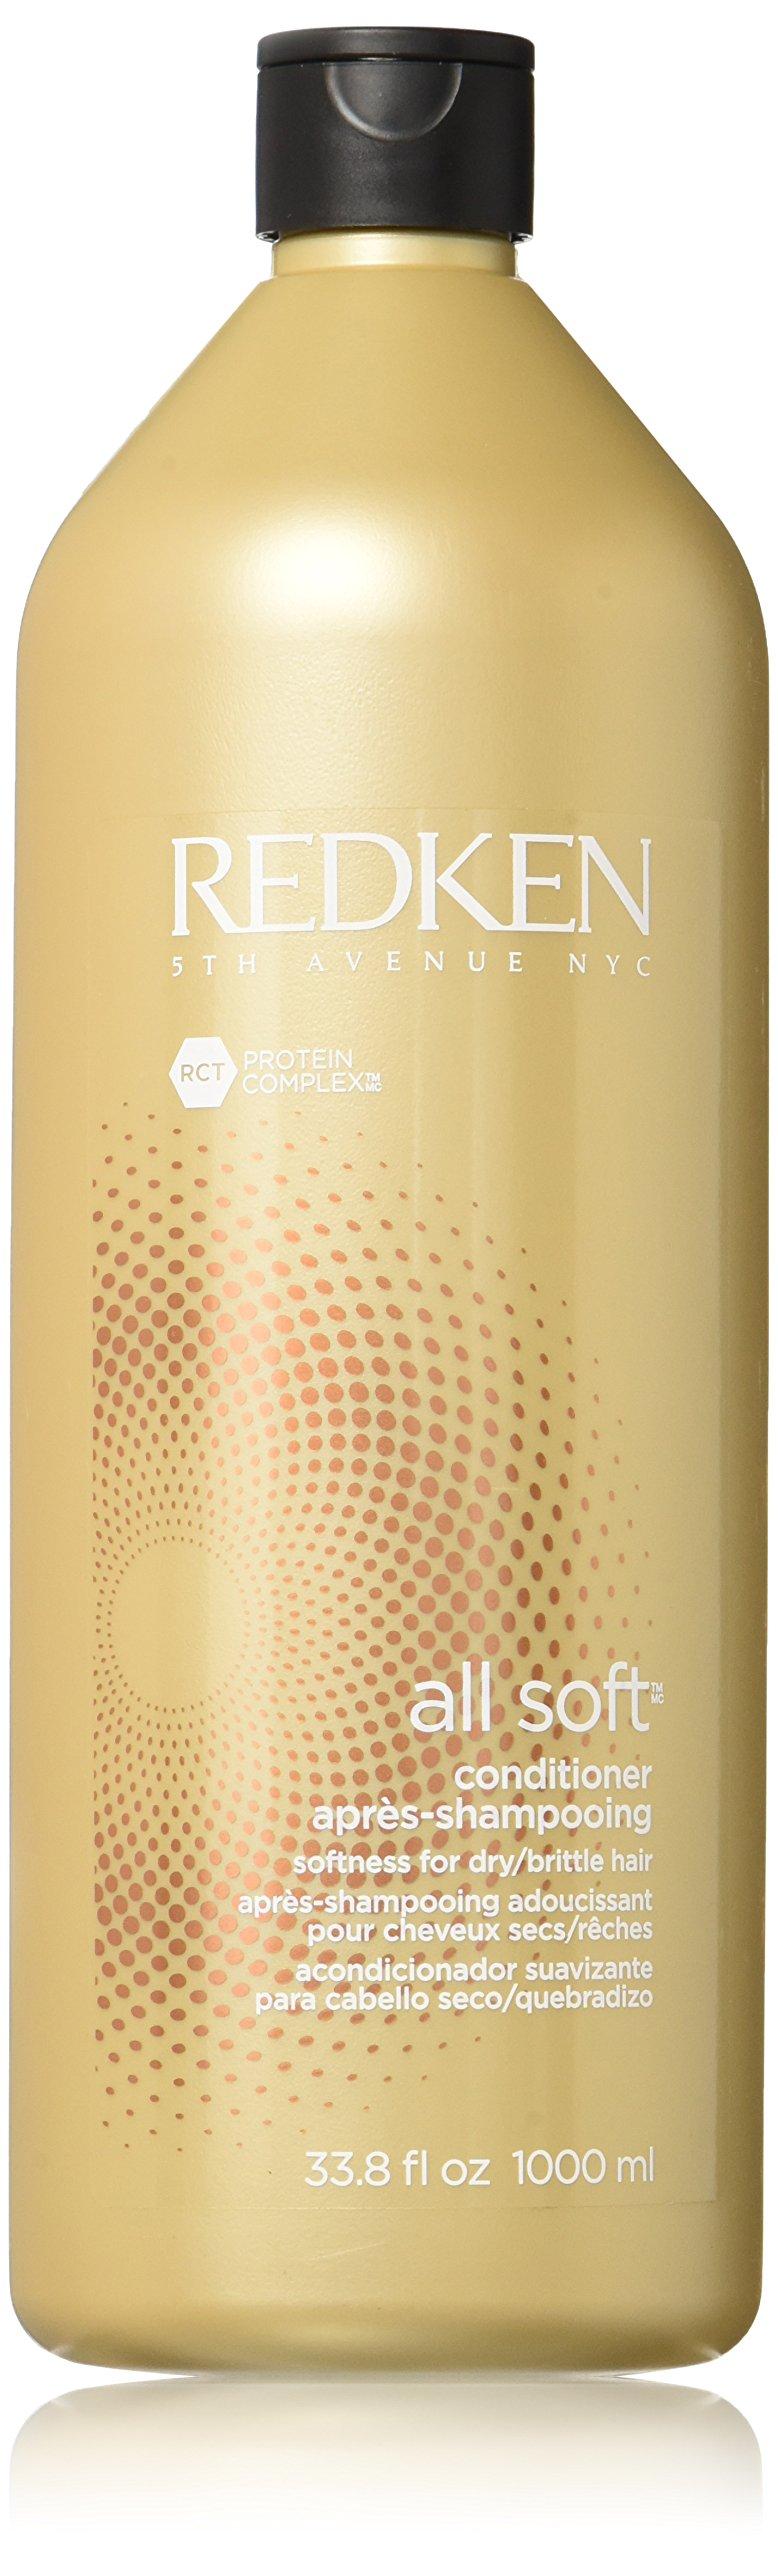 Pokupki/customer/account/login - Redken All Soft Conditioner For Dry Brittle Hair 33 8 Ounces Bottle